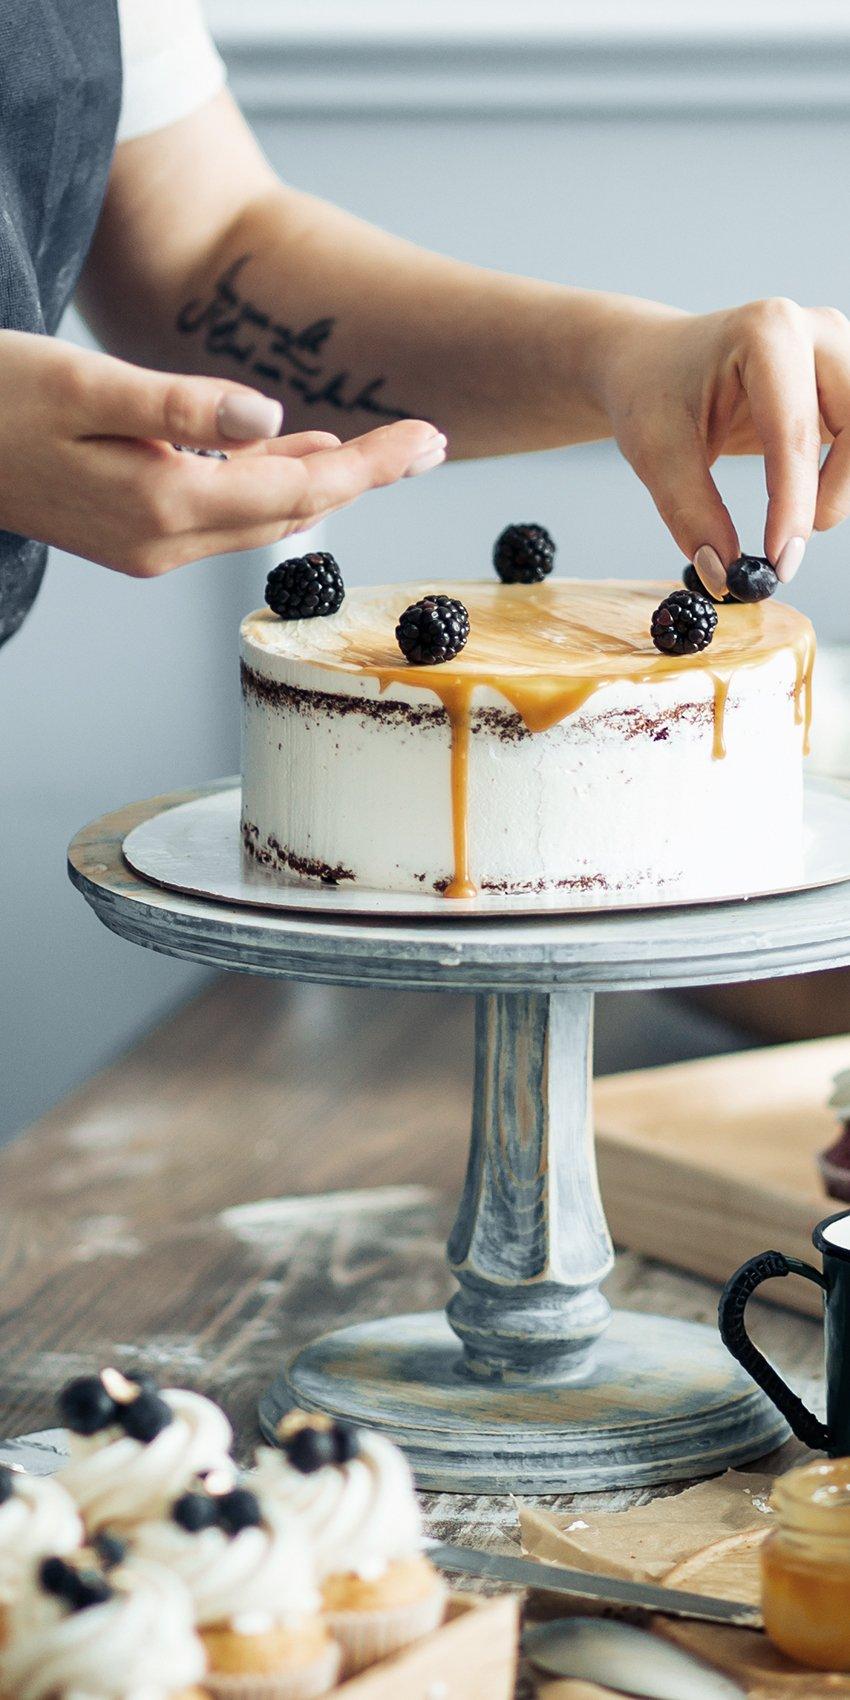 Baker decorating cake